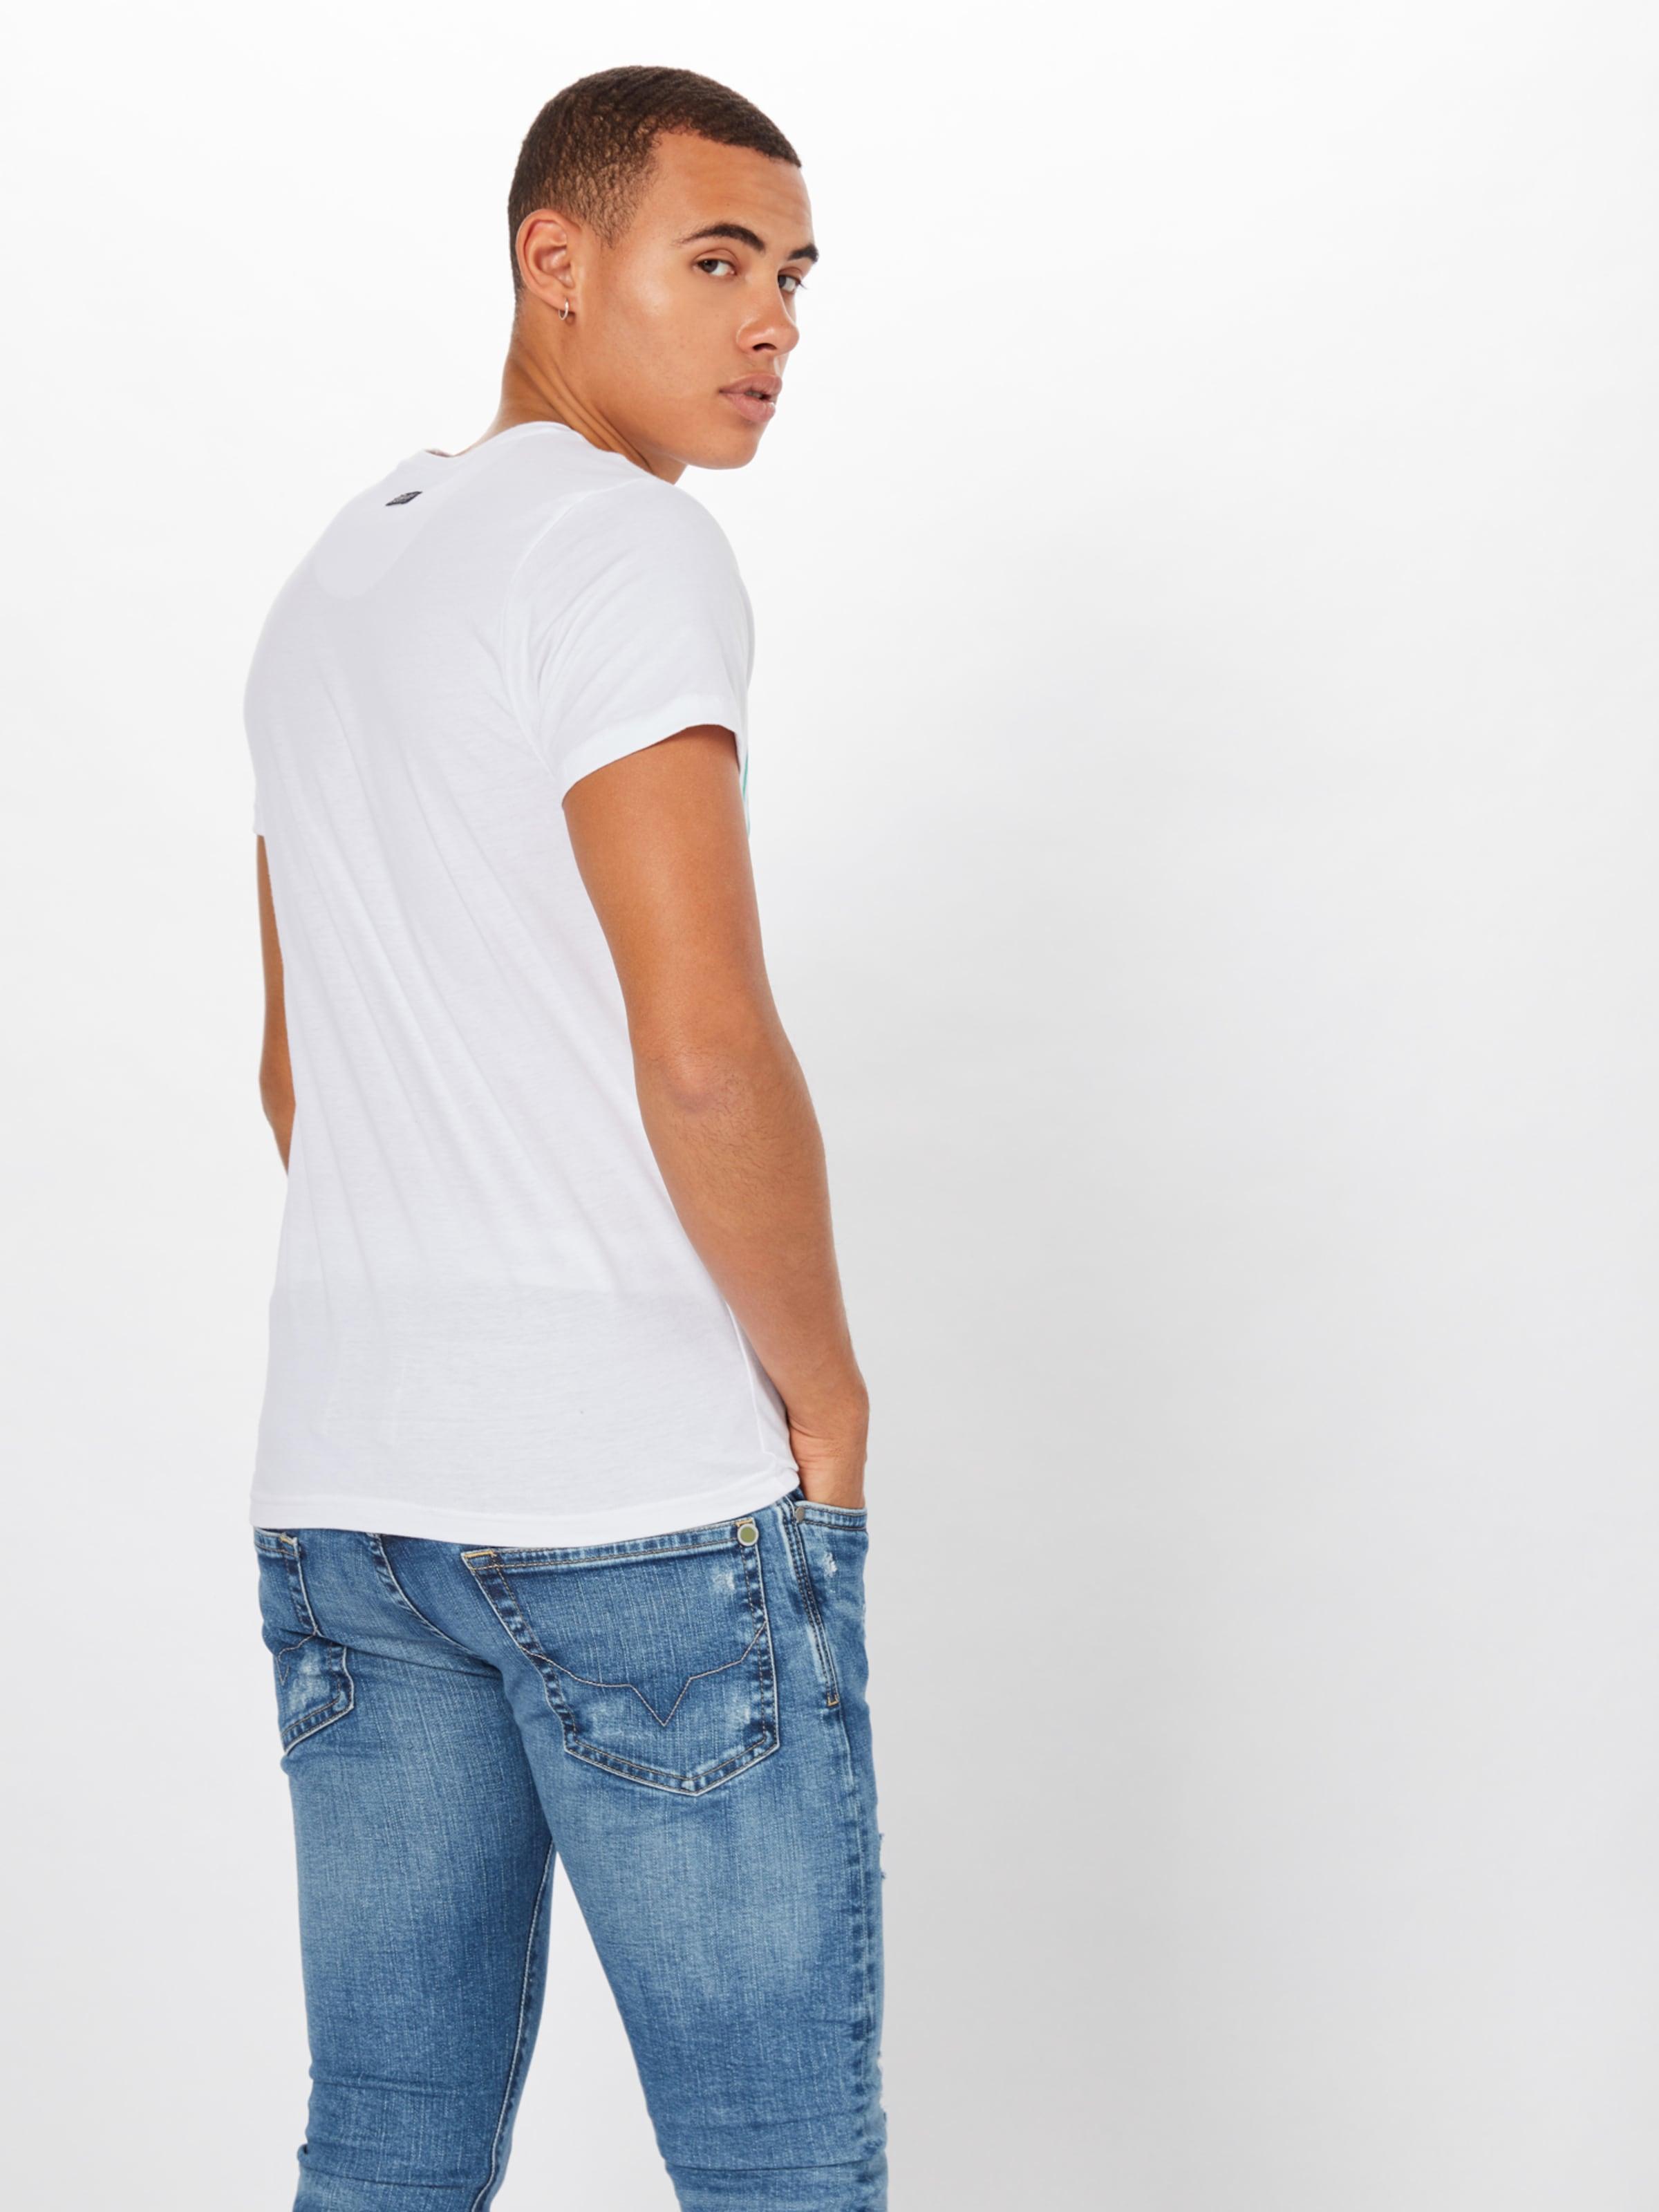 Bleu Petrol shirt En T FoncéVert Industries Blanc UVpLGqzMS